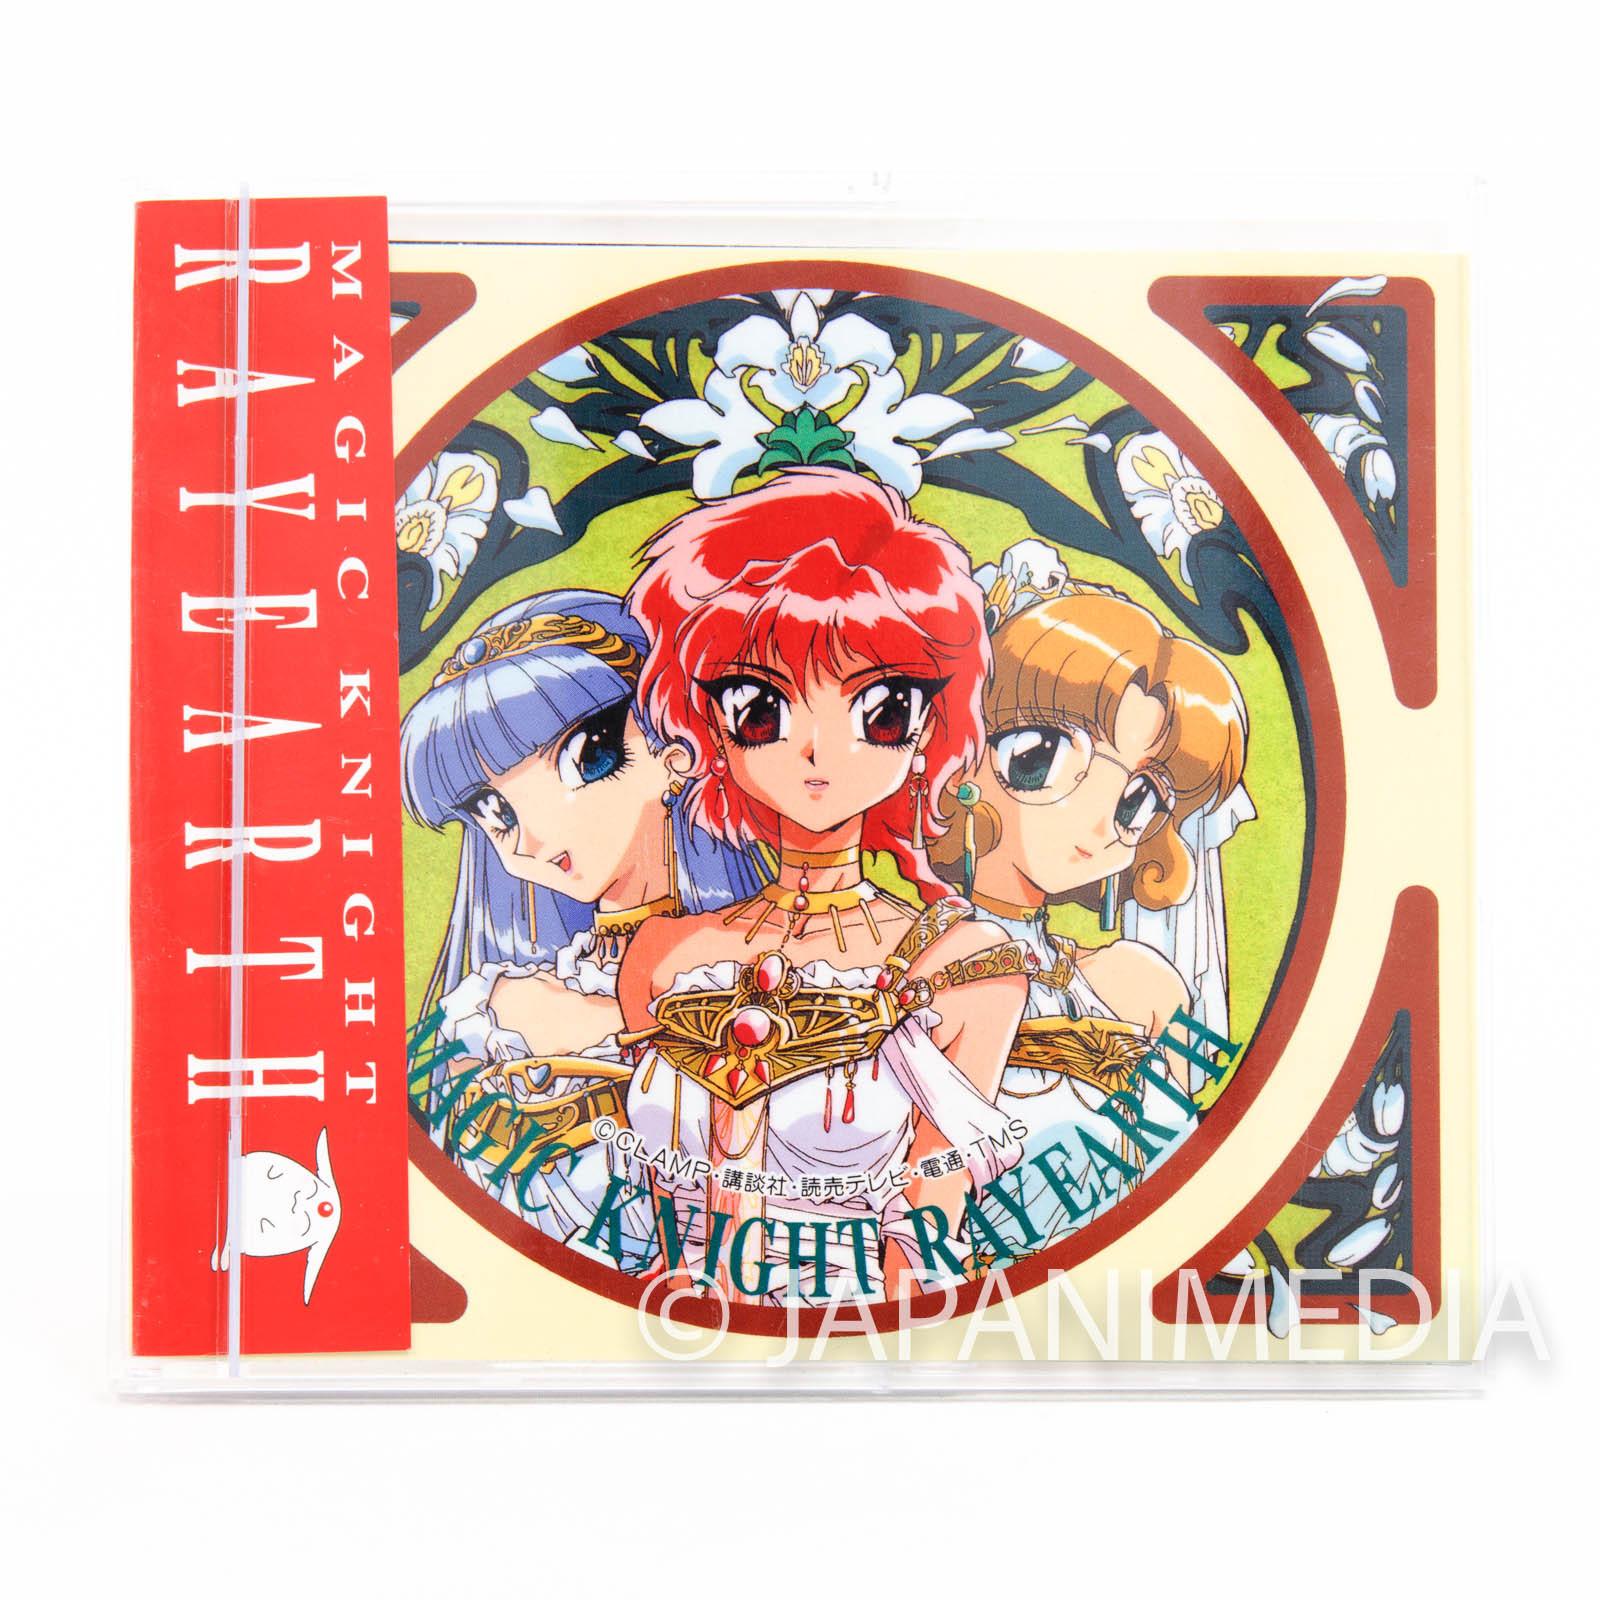 Magic Knight Rayearth Sticker collection 6 sheet Set JAPAN ANIME